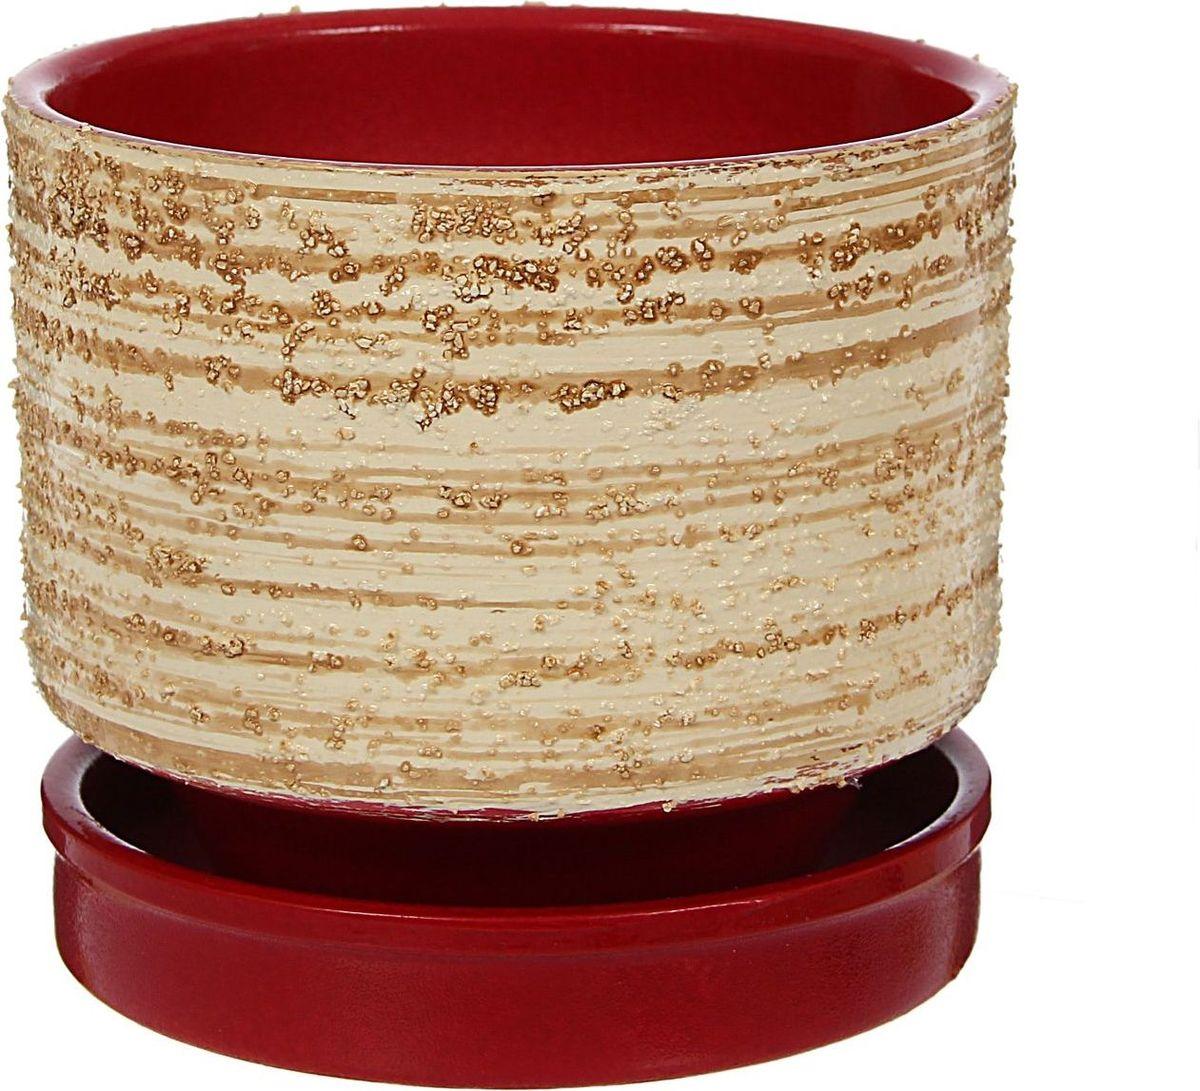 Кашпо Рельеф, цвет: бордовый, 13 х 13 х 12 см1422008